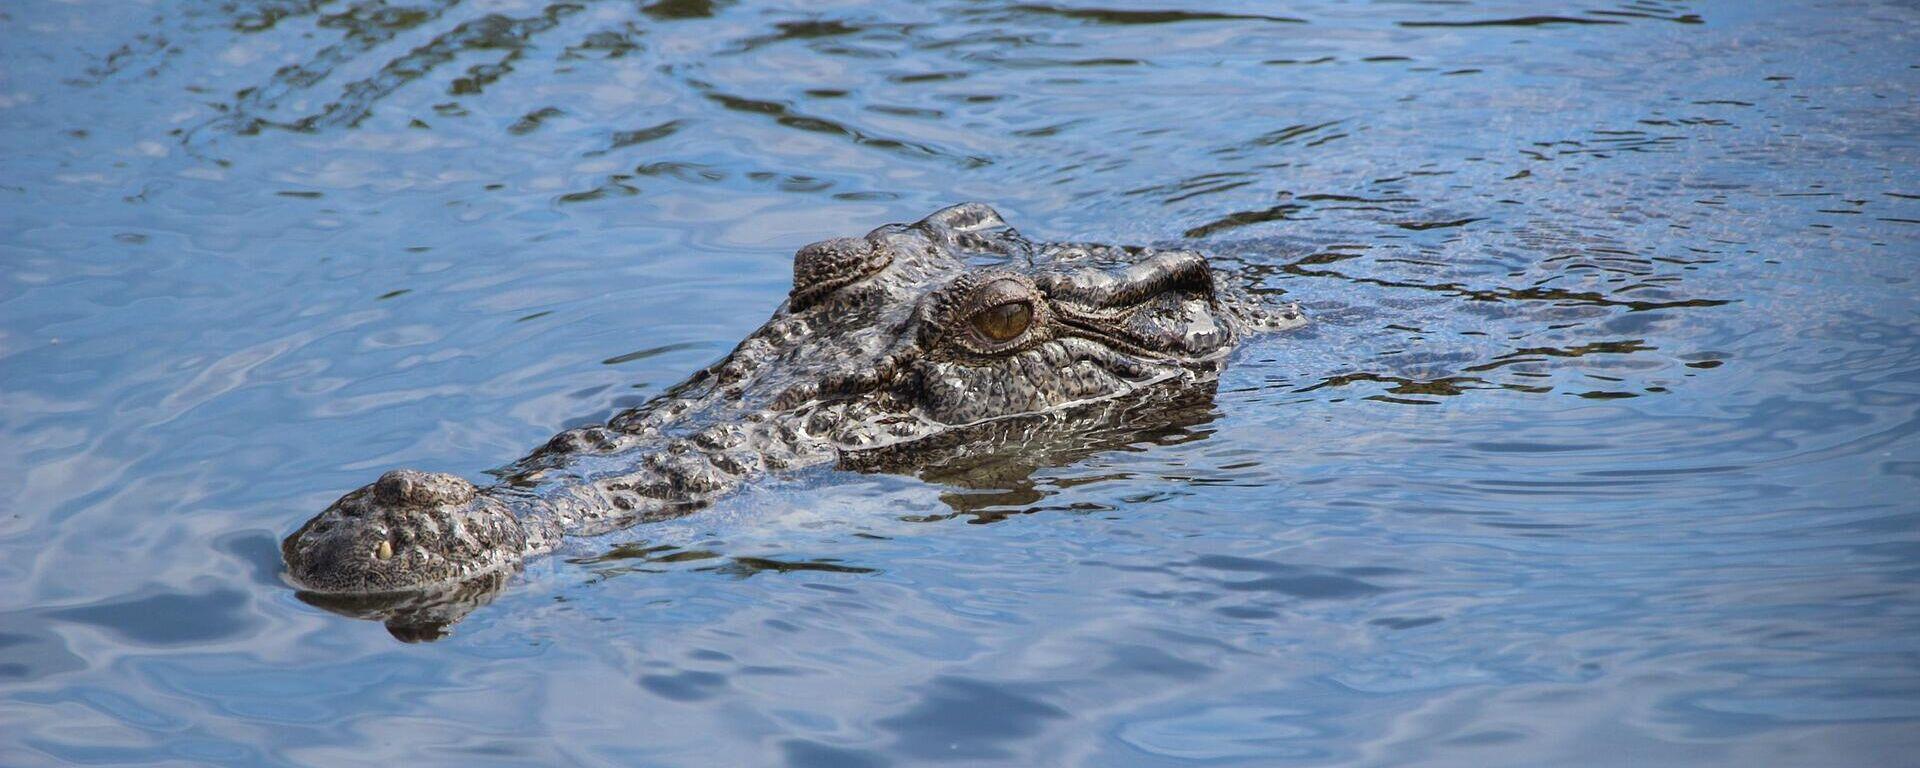 Krokodil (Symbolbild) - SNA, 1920, 05.04.2021